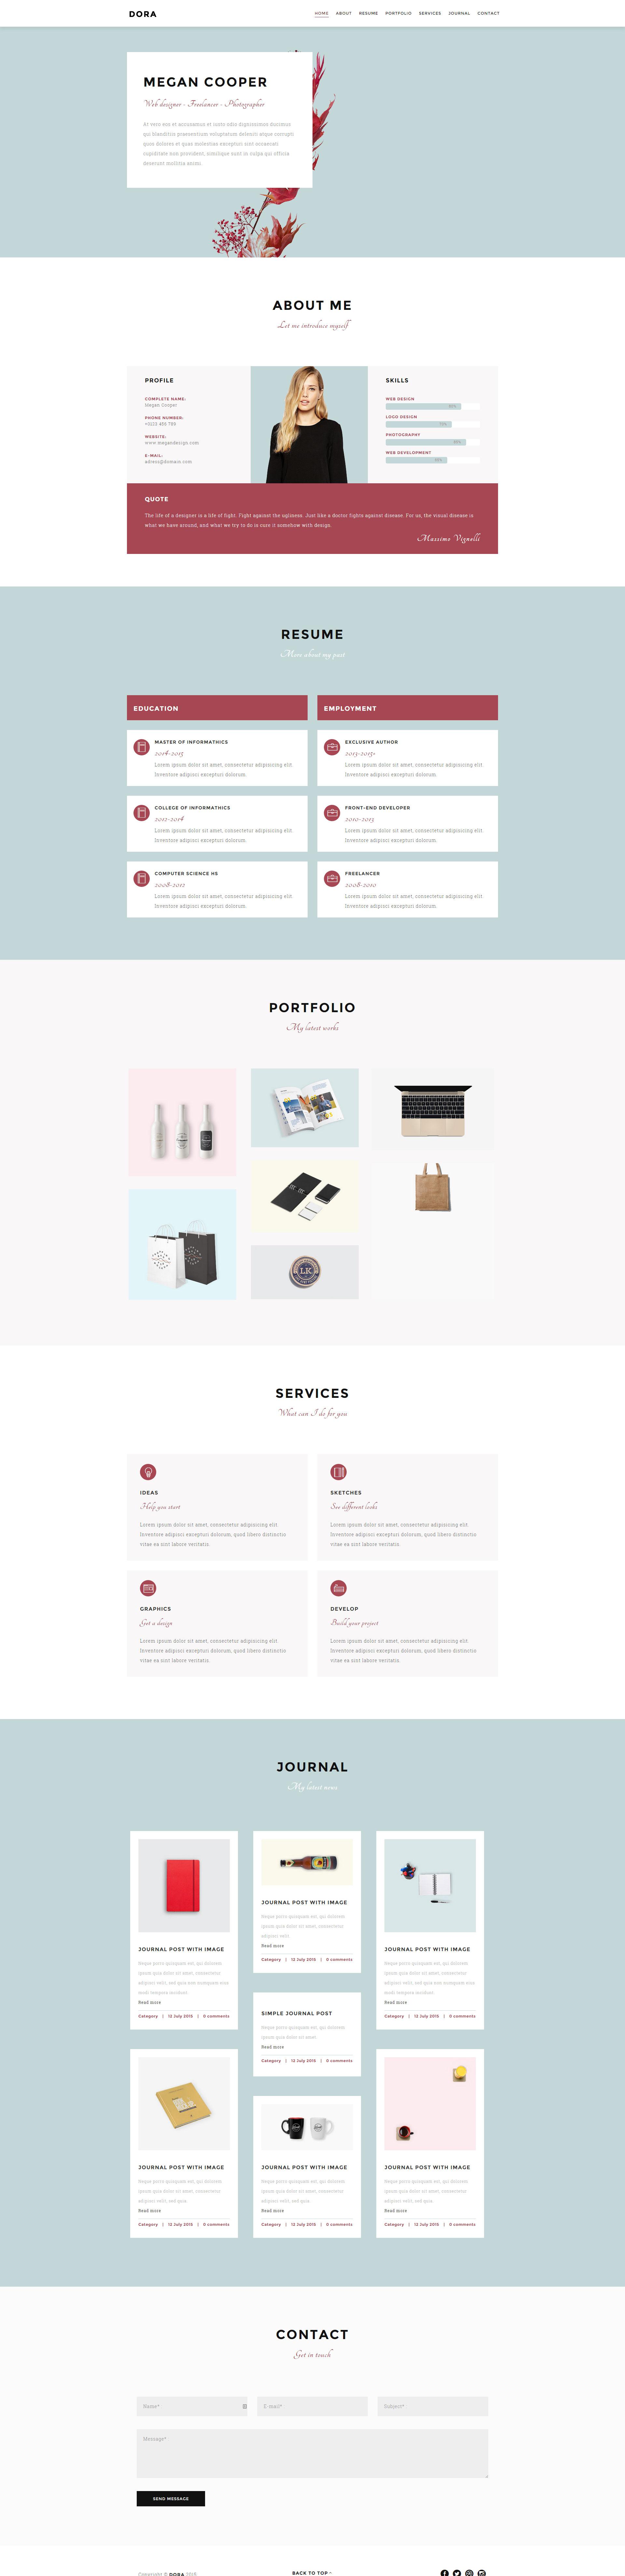 Graphista OnePage Creative Portfolio Personal Portfolio - Digital portfolio template